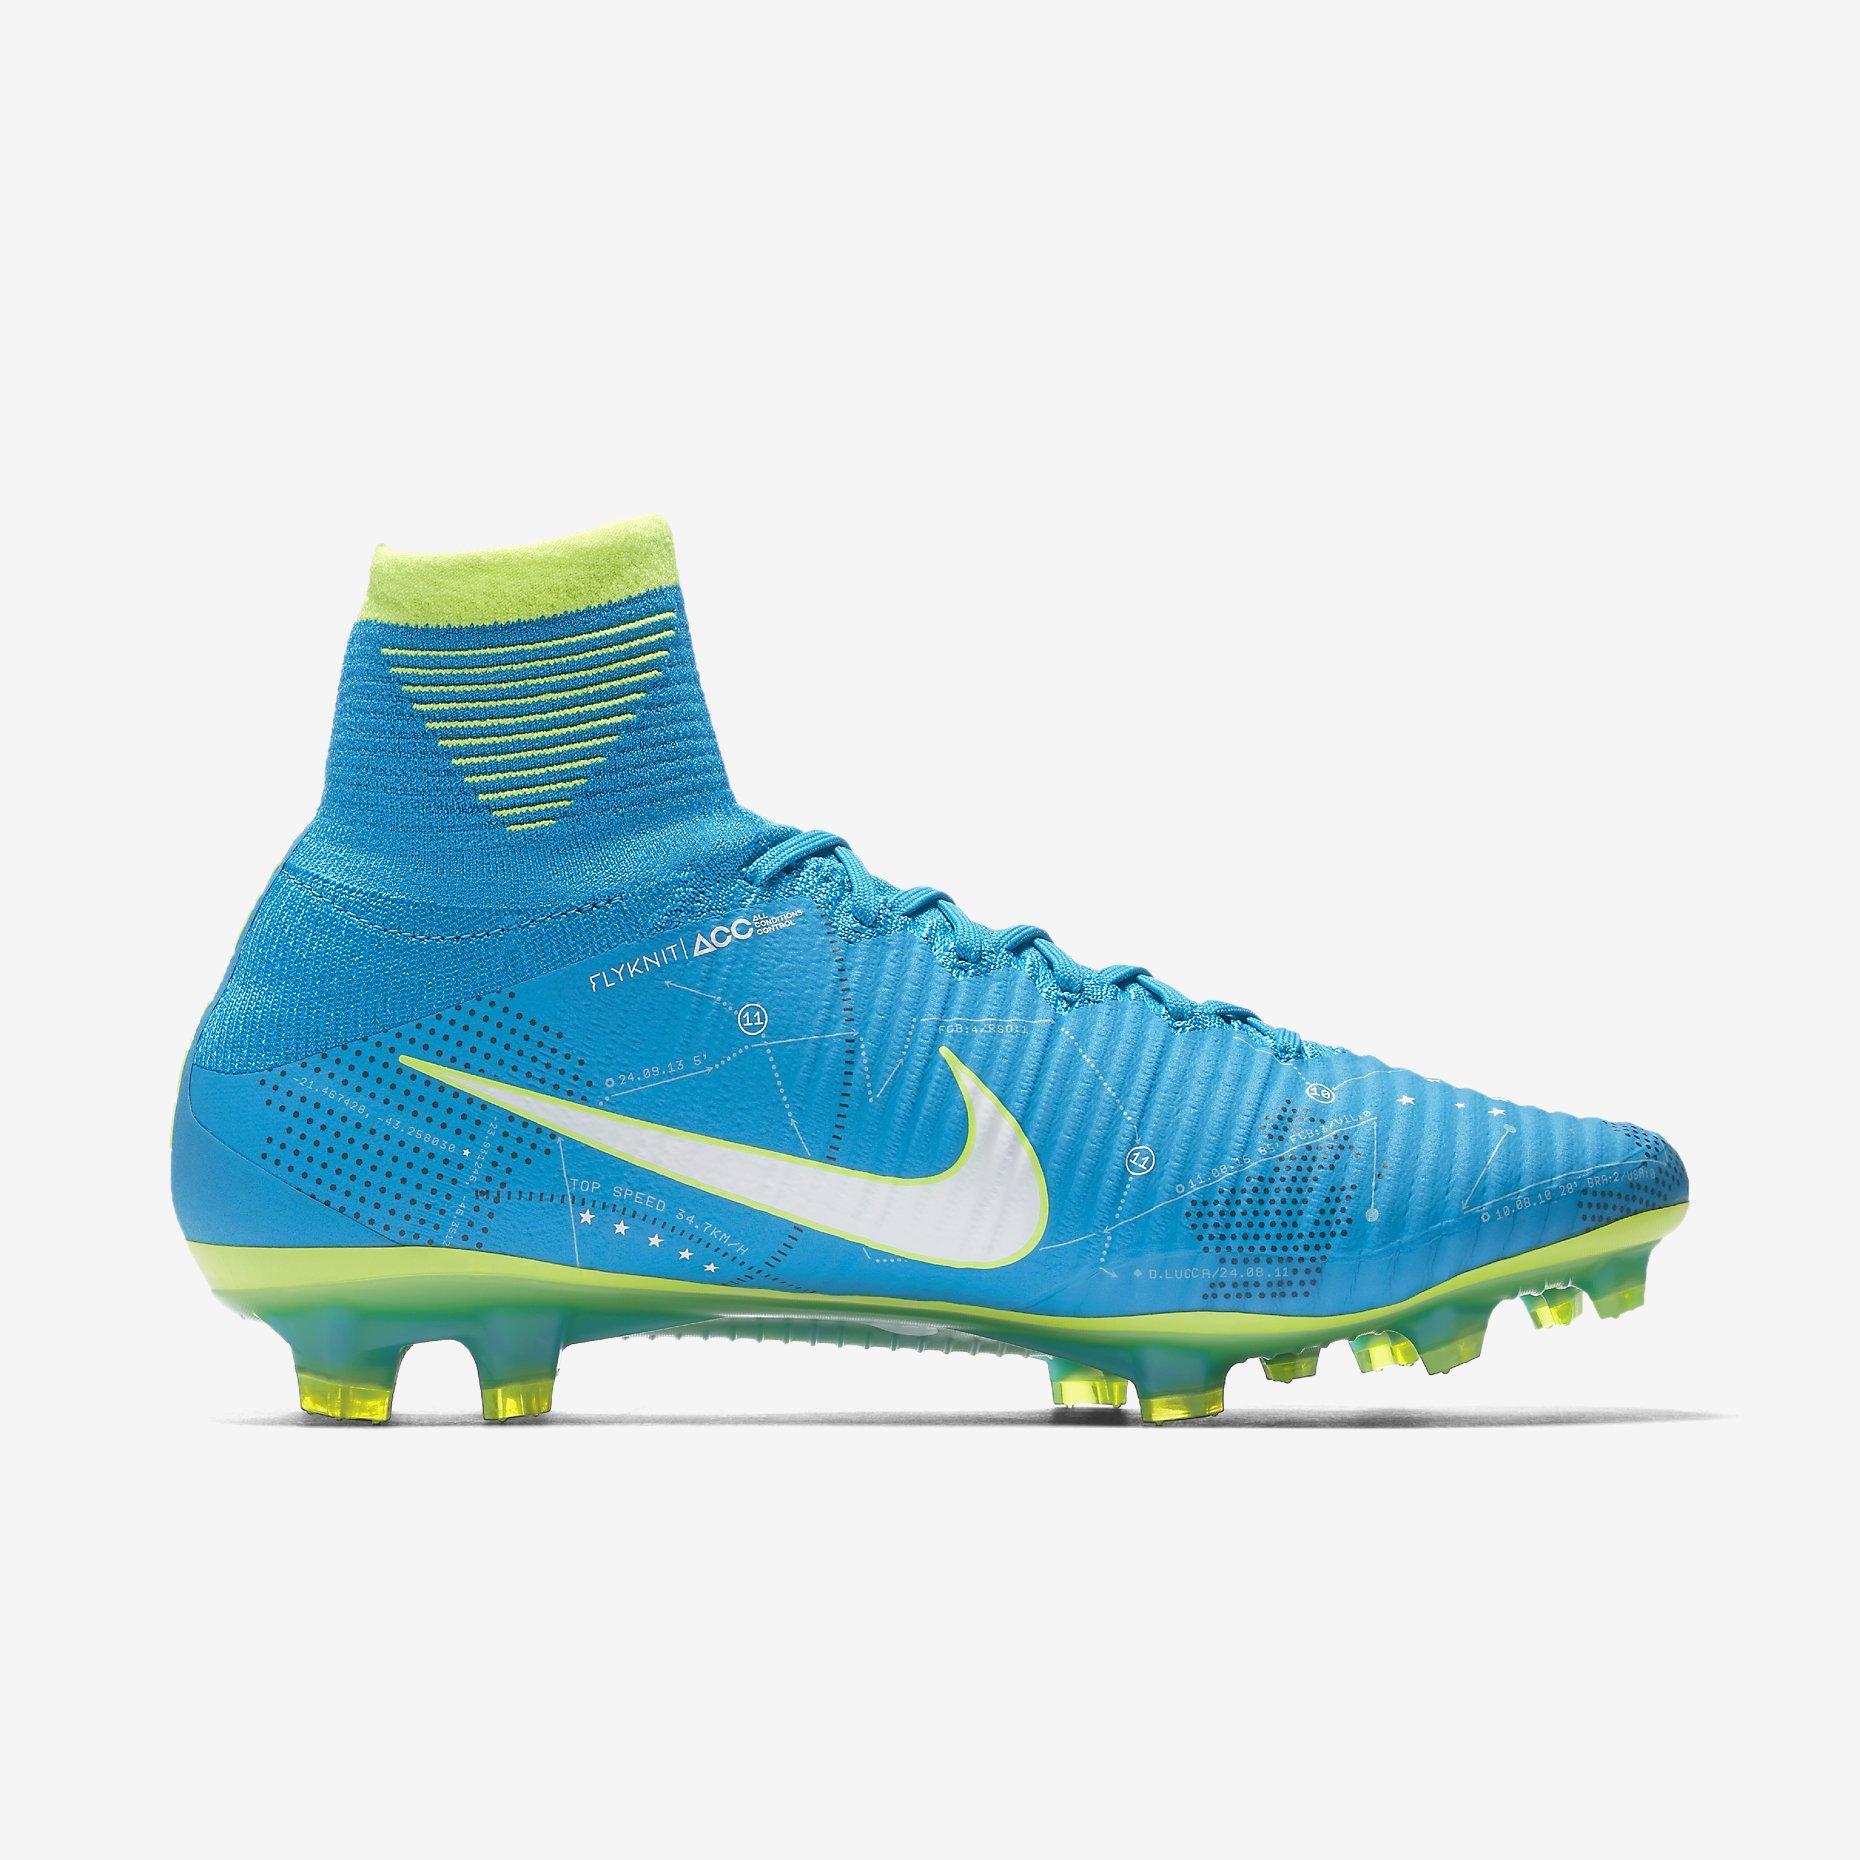 premium selection 7e151 9e9e1 Nike Mercurial Superfly V Dynamic Fit Neymar FG - Blue Orbit ...